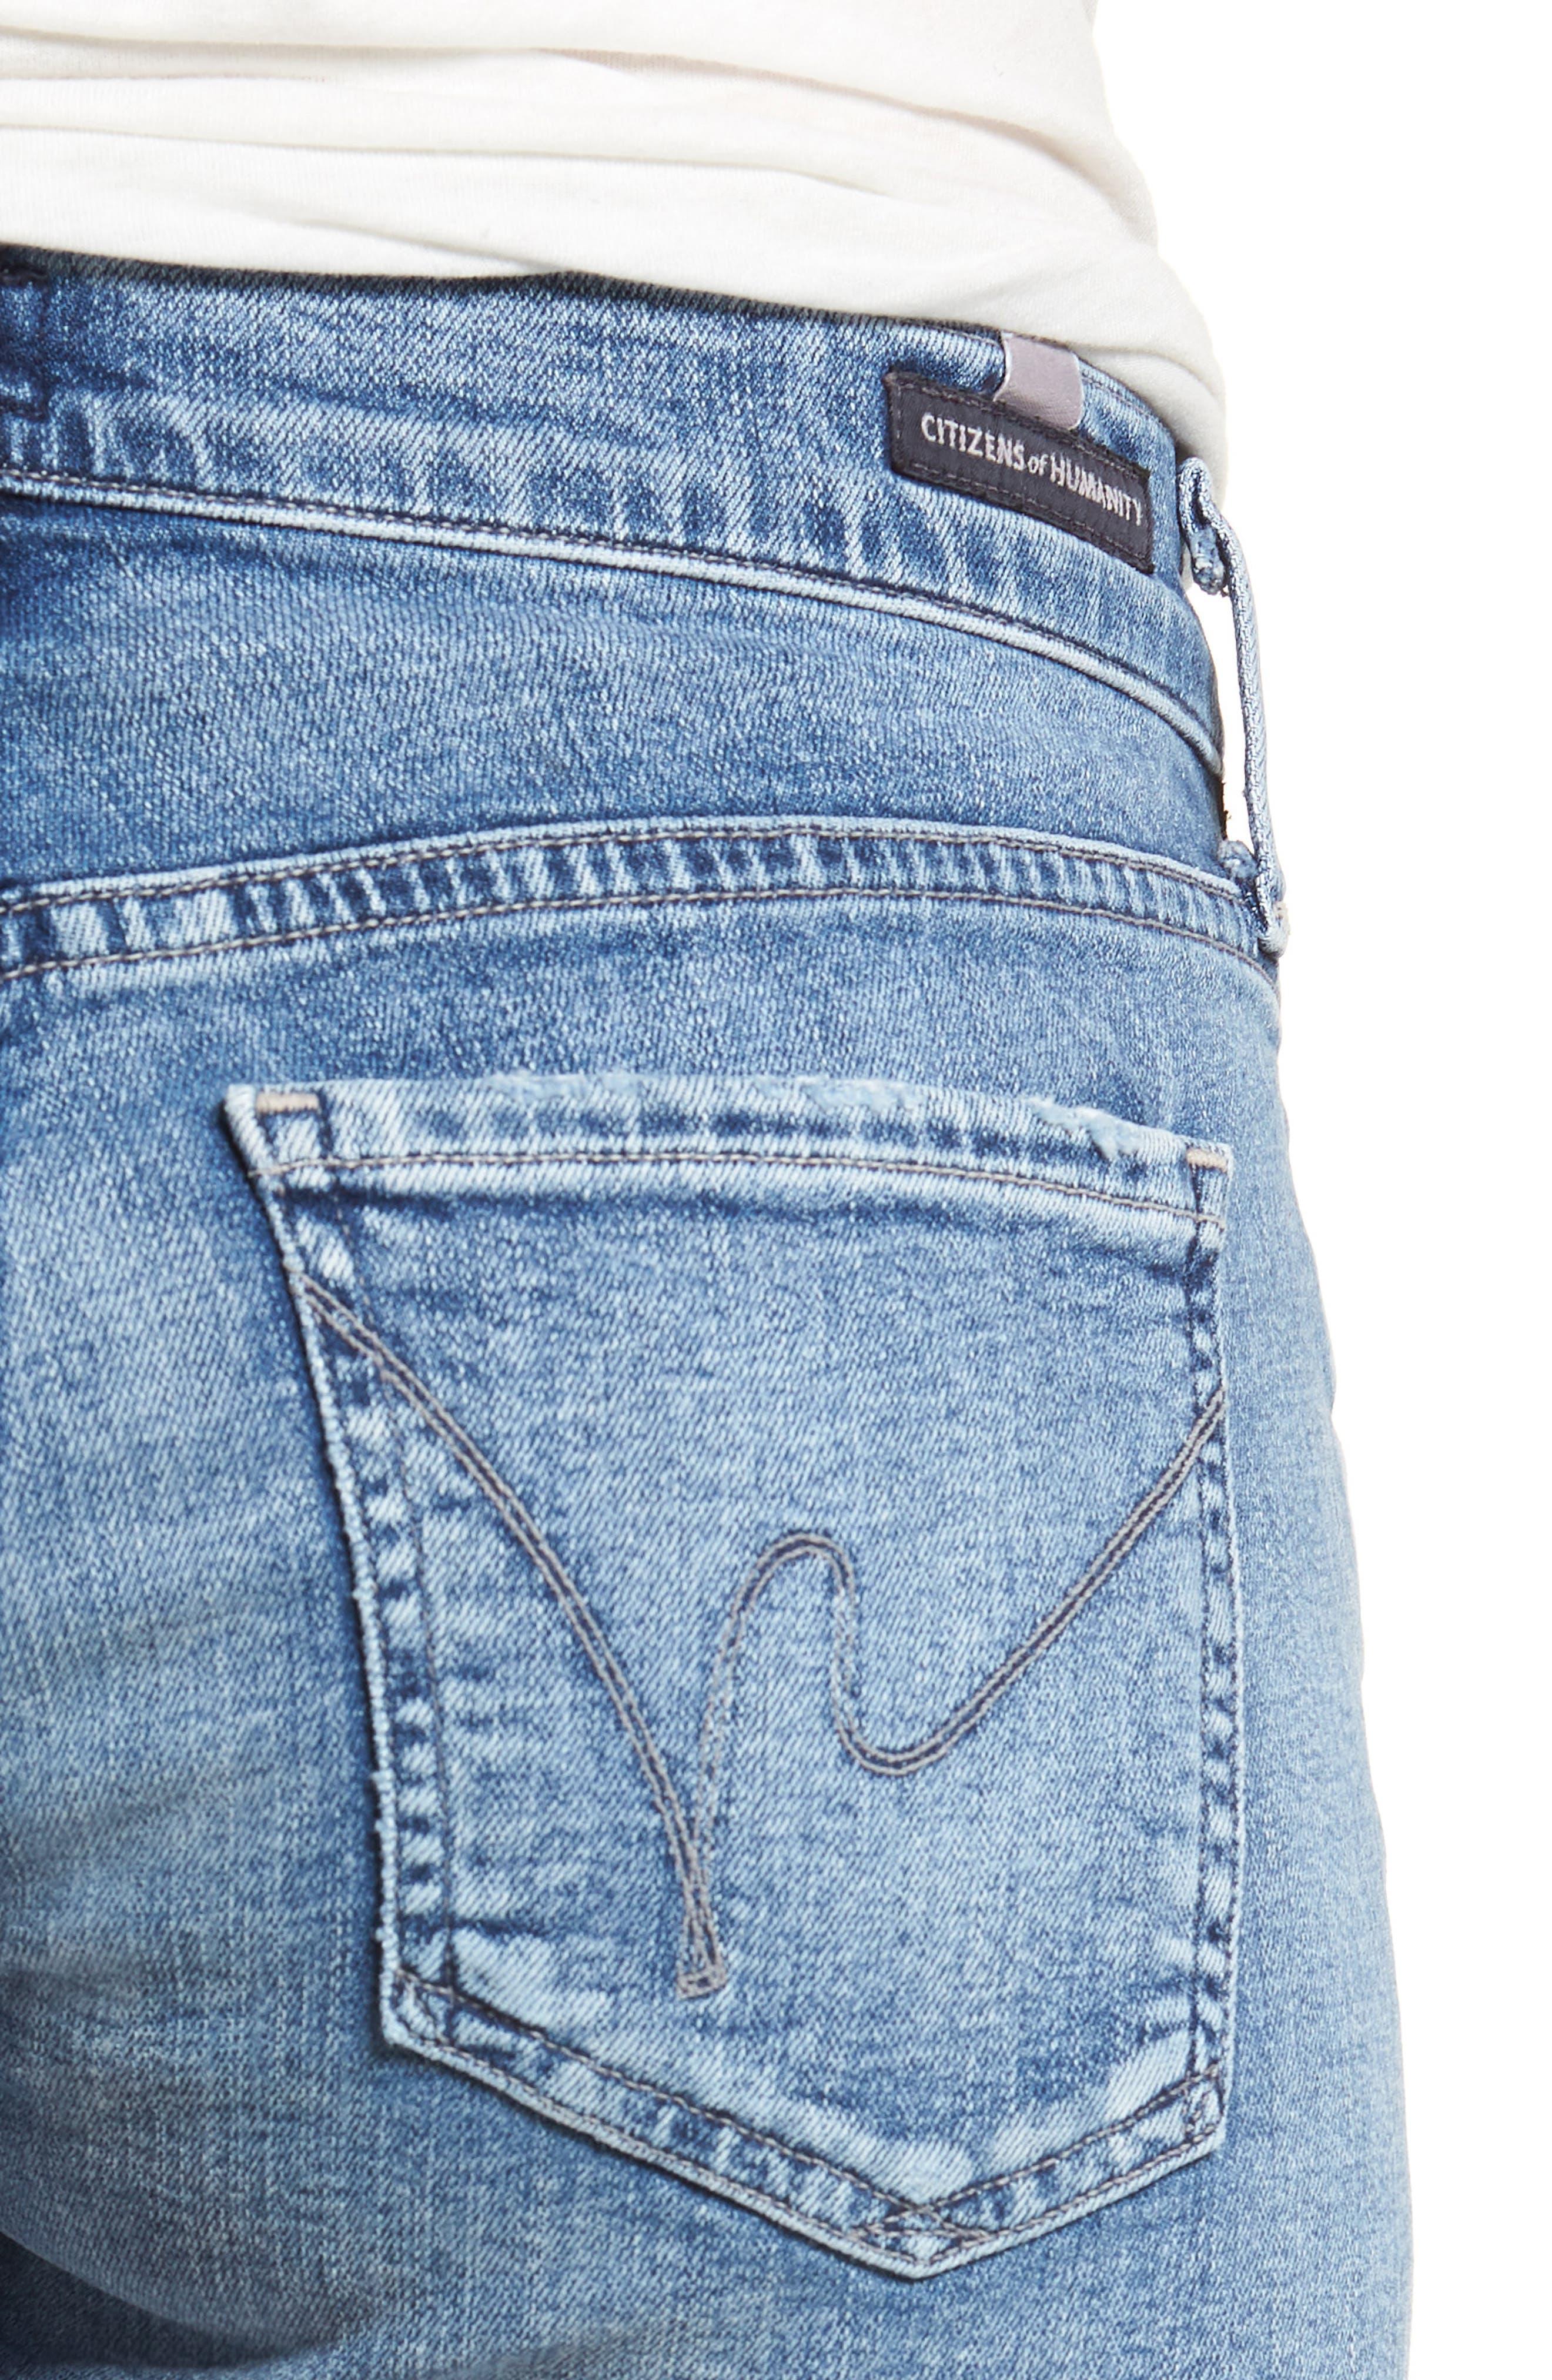 Alternate Image 4  - Citizens of Humanity Ava Cutoff Denim Shorts (Pacifica)